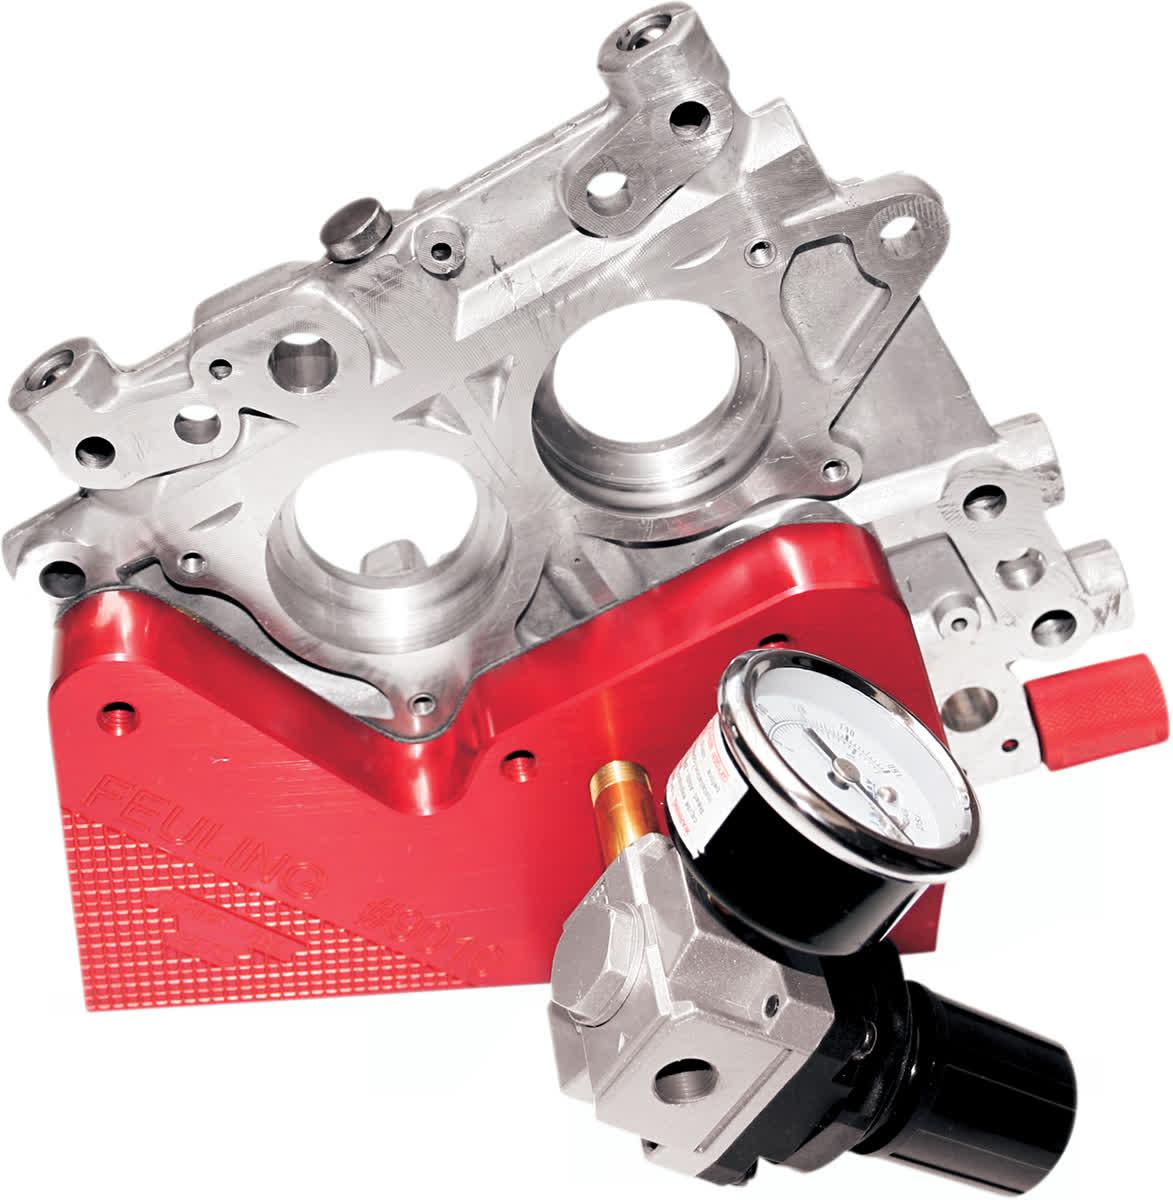 Feuling 9010 Pressure Relief Psi Testing Tool